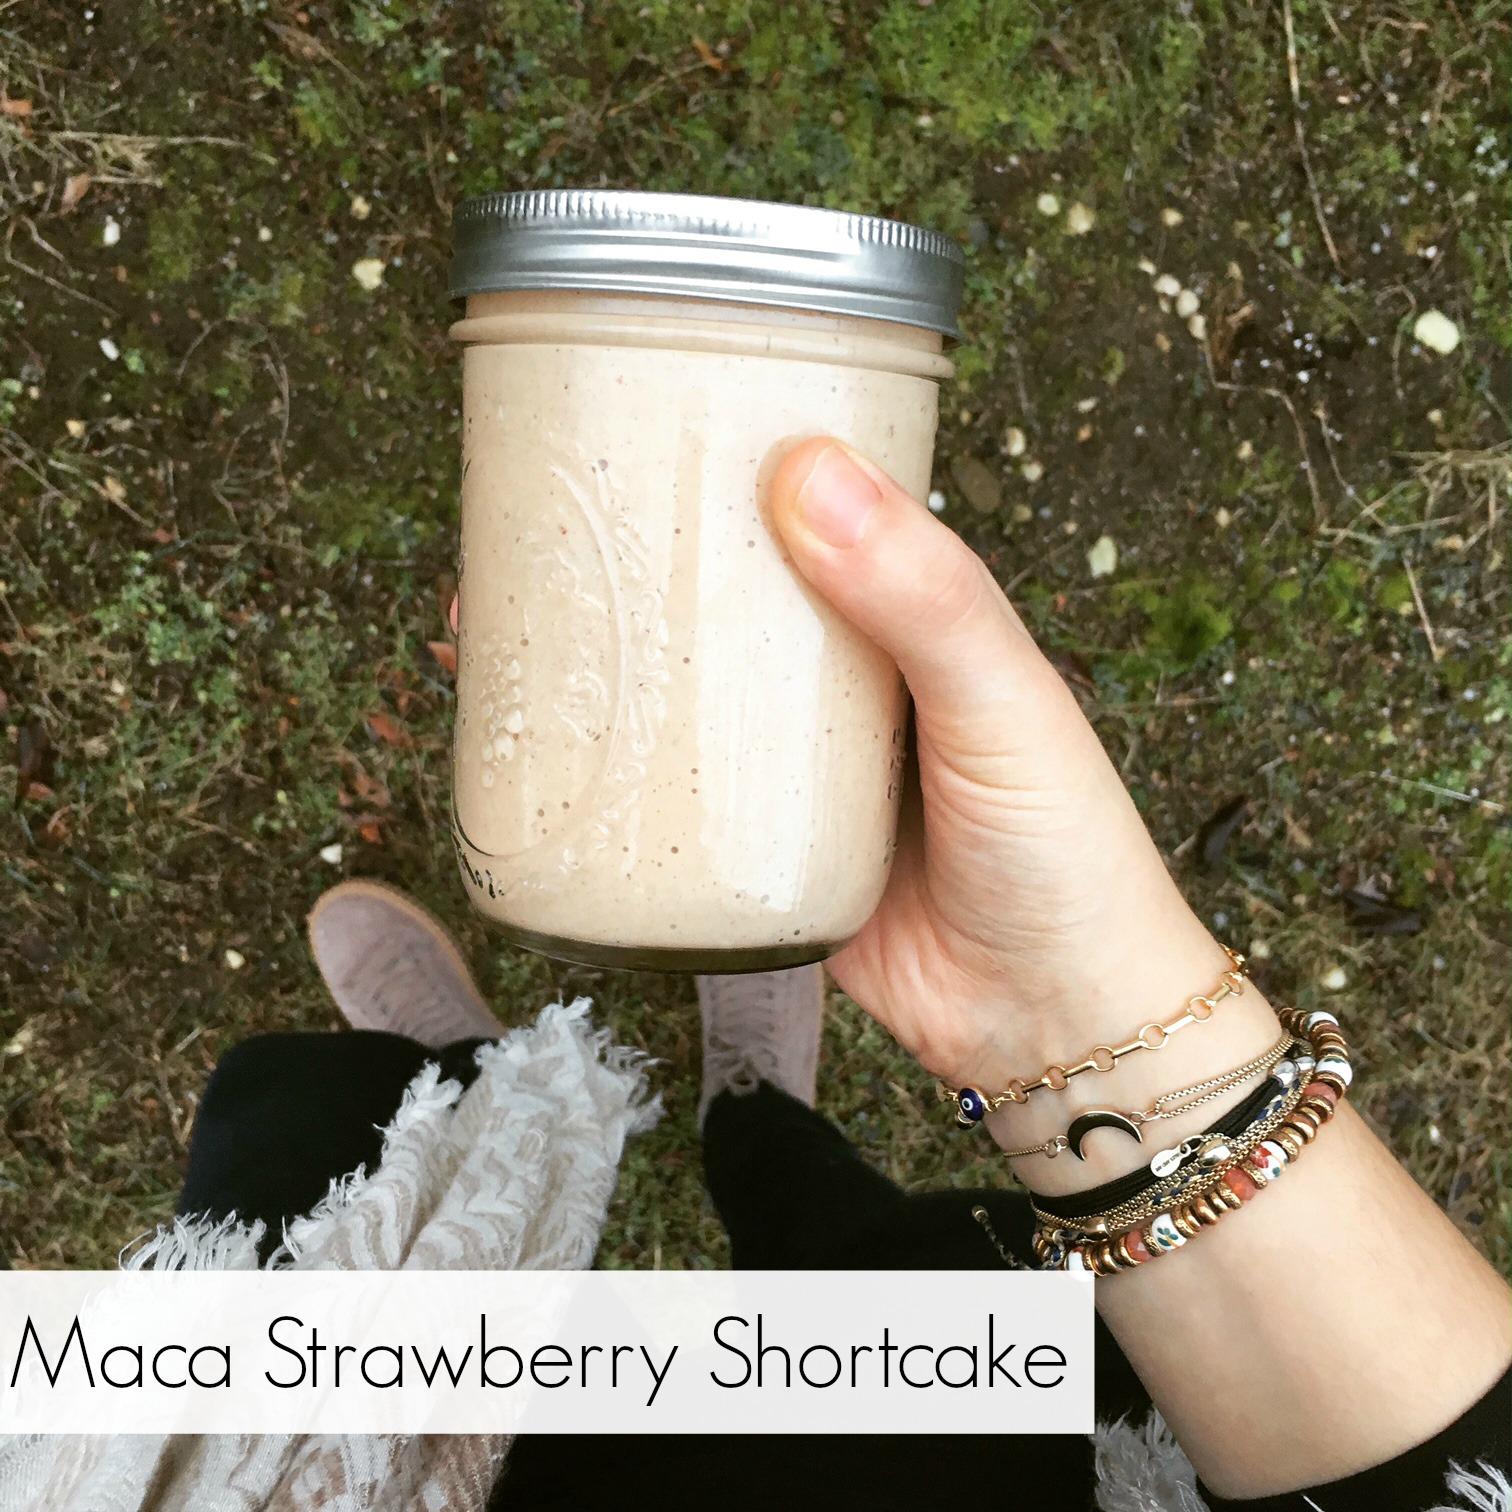 Maca Strawberry Shortcake Smoothie